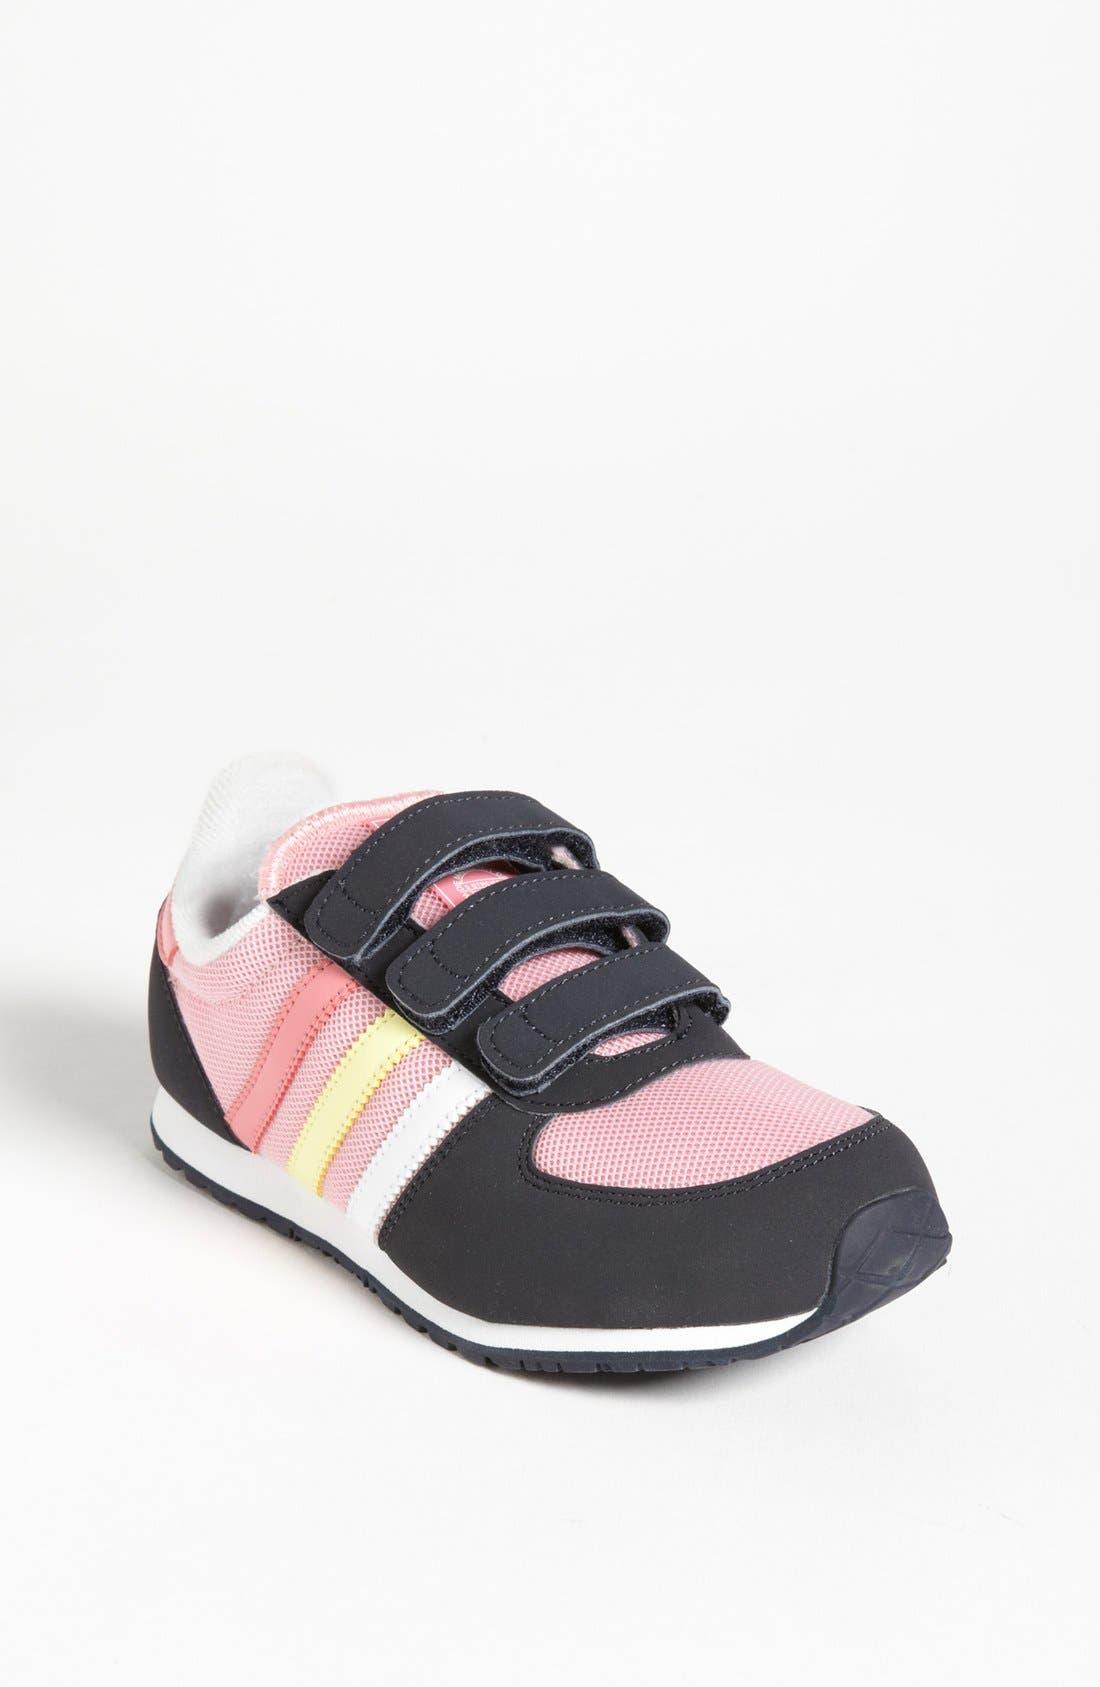 Main Image - adidas 'adistar Racer' Sneaker (Toddler & Little Kid)